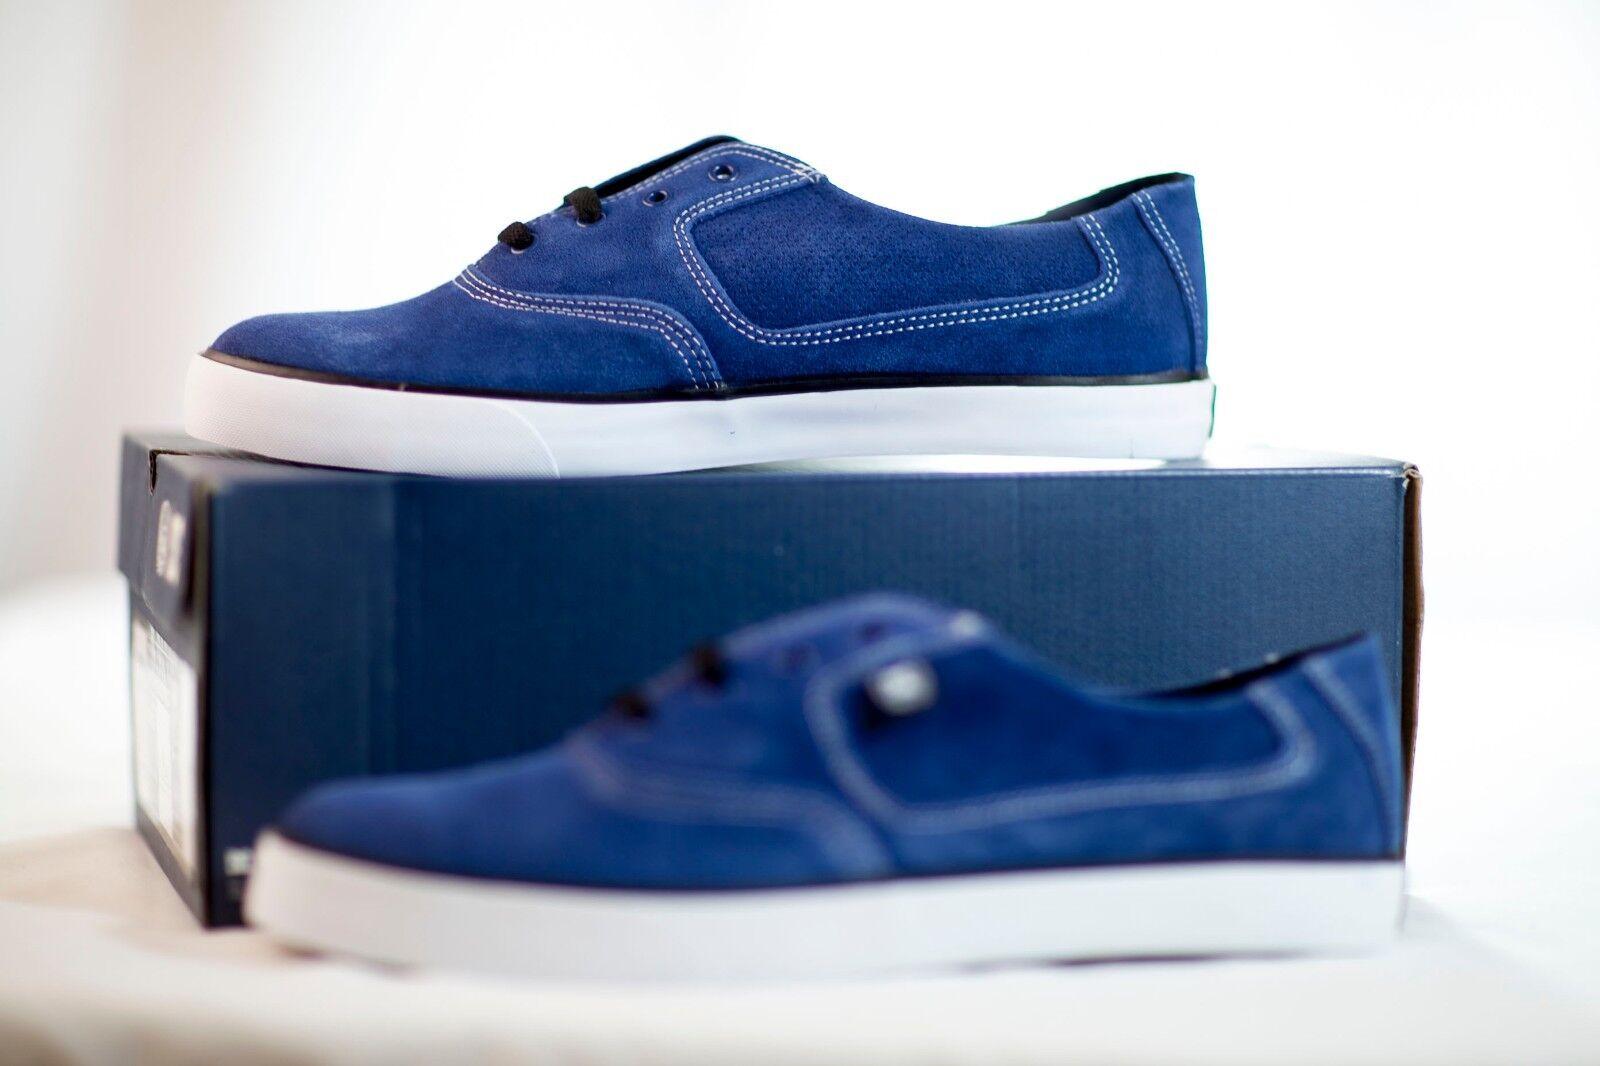 DC DC DC Zapatos Fix S BERRICS skate Para hombres Zapatos de raíces Azul/Blanco Talla M11.5 Nuevo en Caja a1af5b